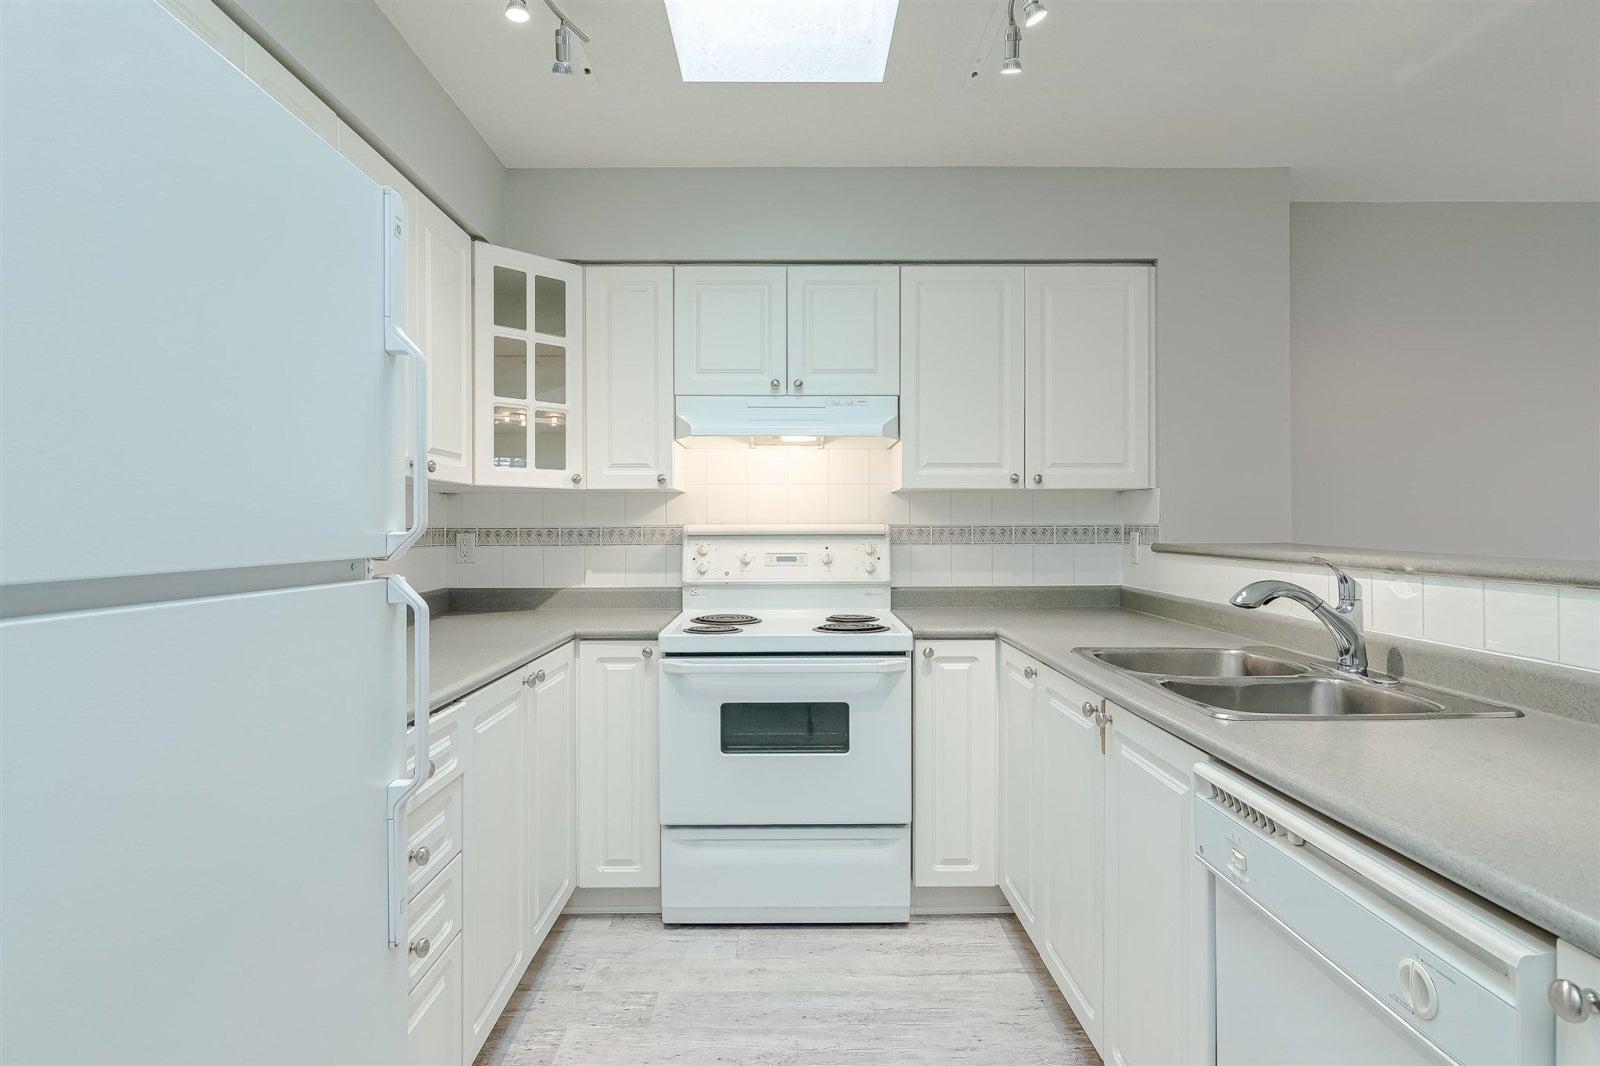 405 20268 54 AVENUE - Langley City Apartment/Condo for sale, 2 Bedrooms (R2604183) #6